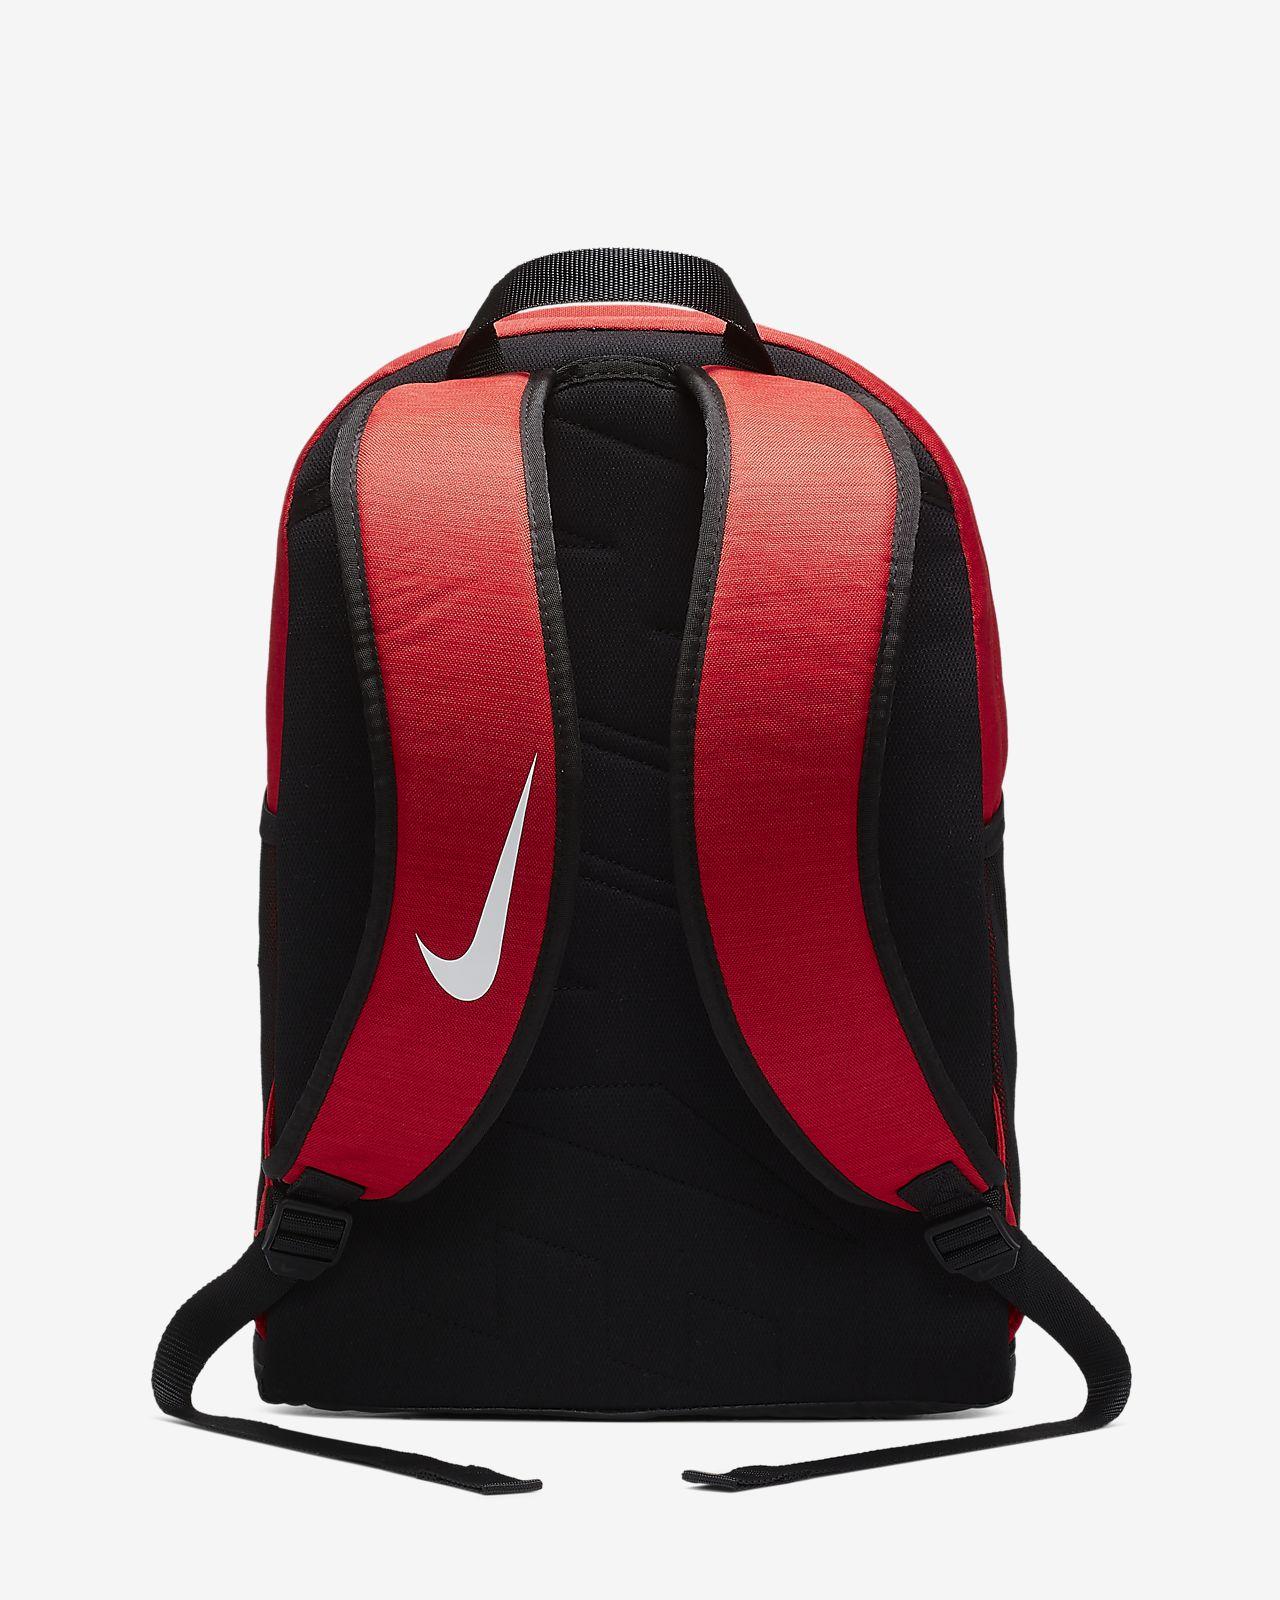 7248be224d4e44 Nike Brasilia (Medium) Training Backpack. Nike.com IN